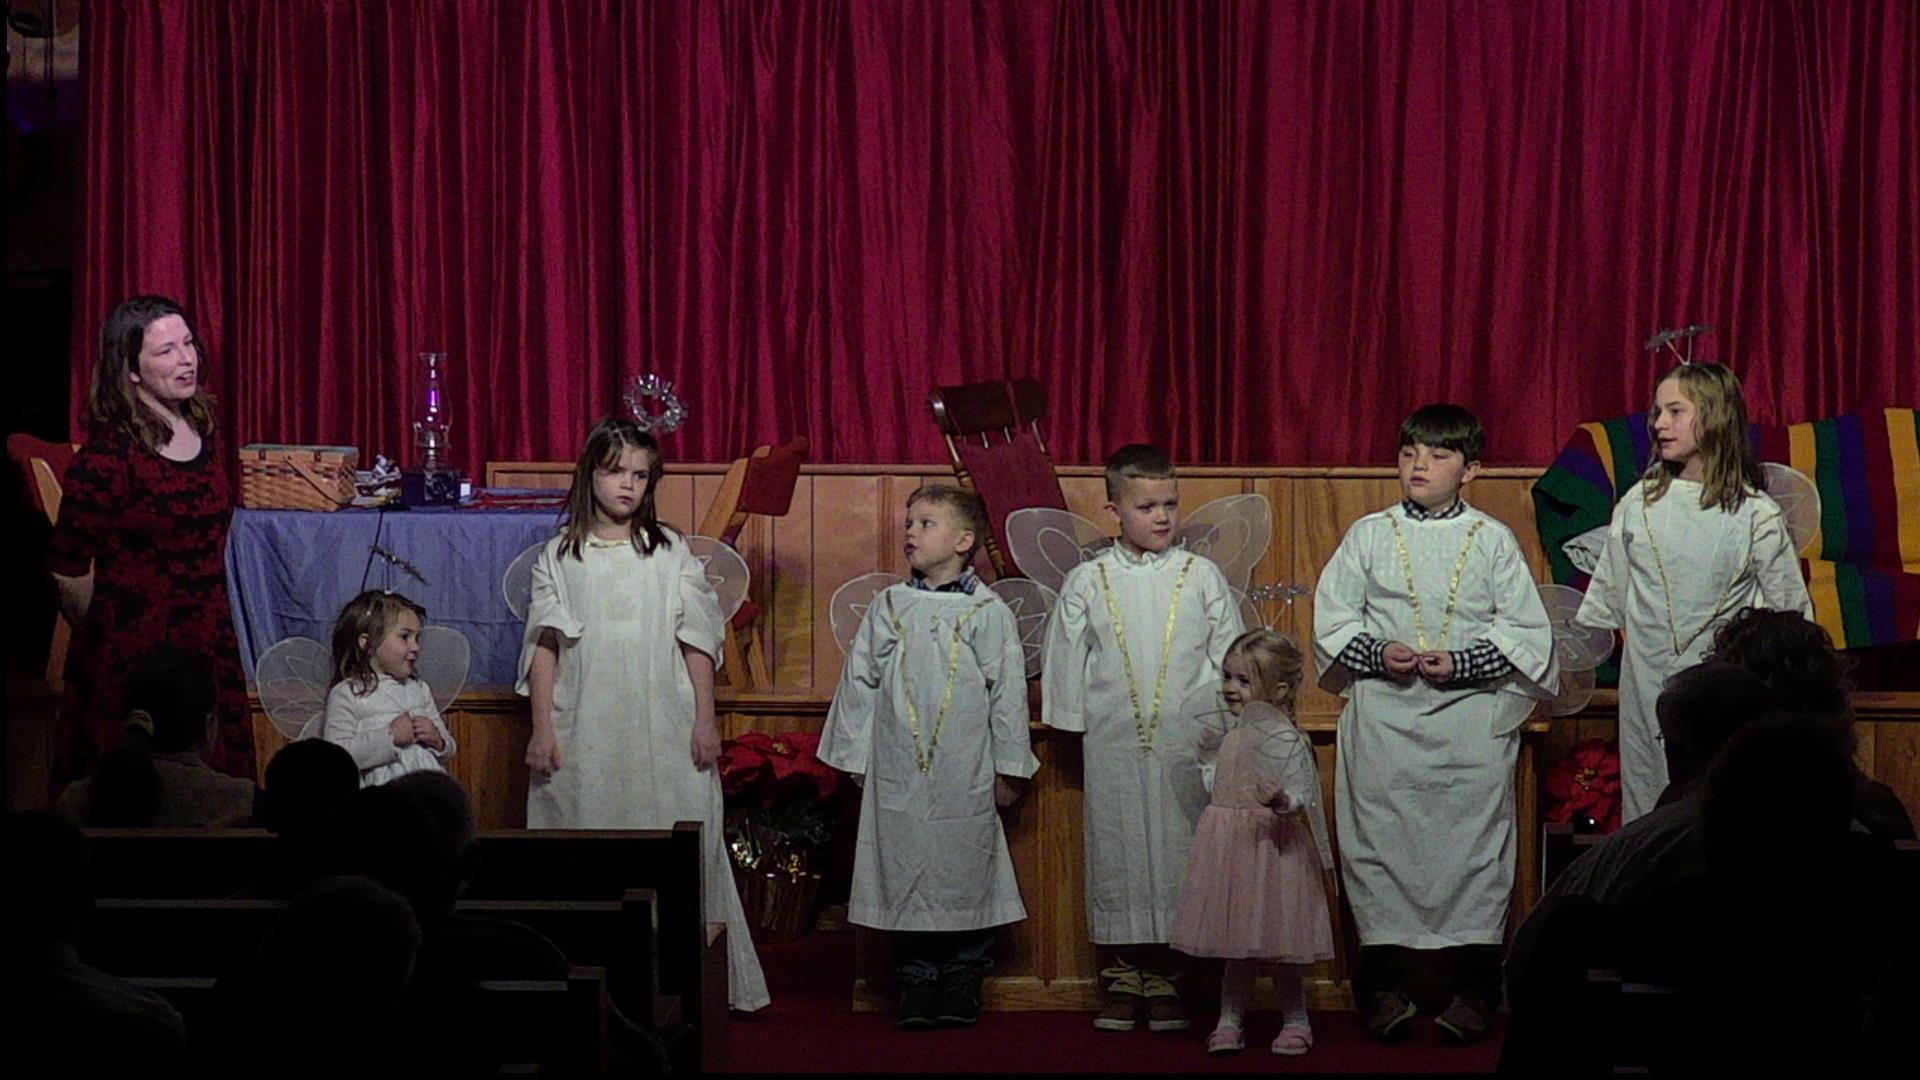 Children's - Christmas Play